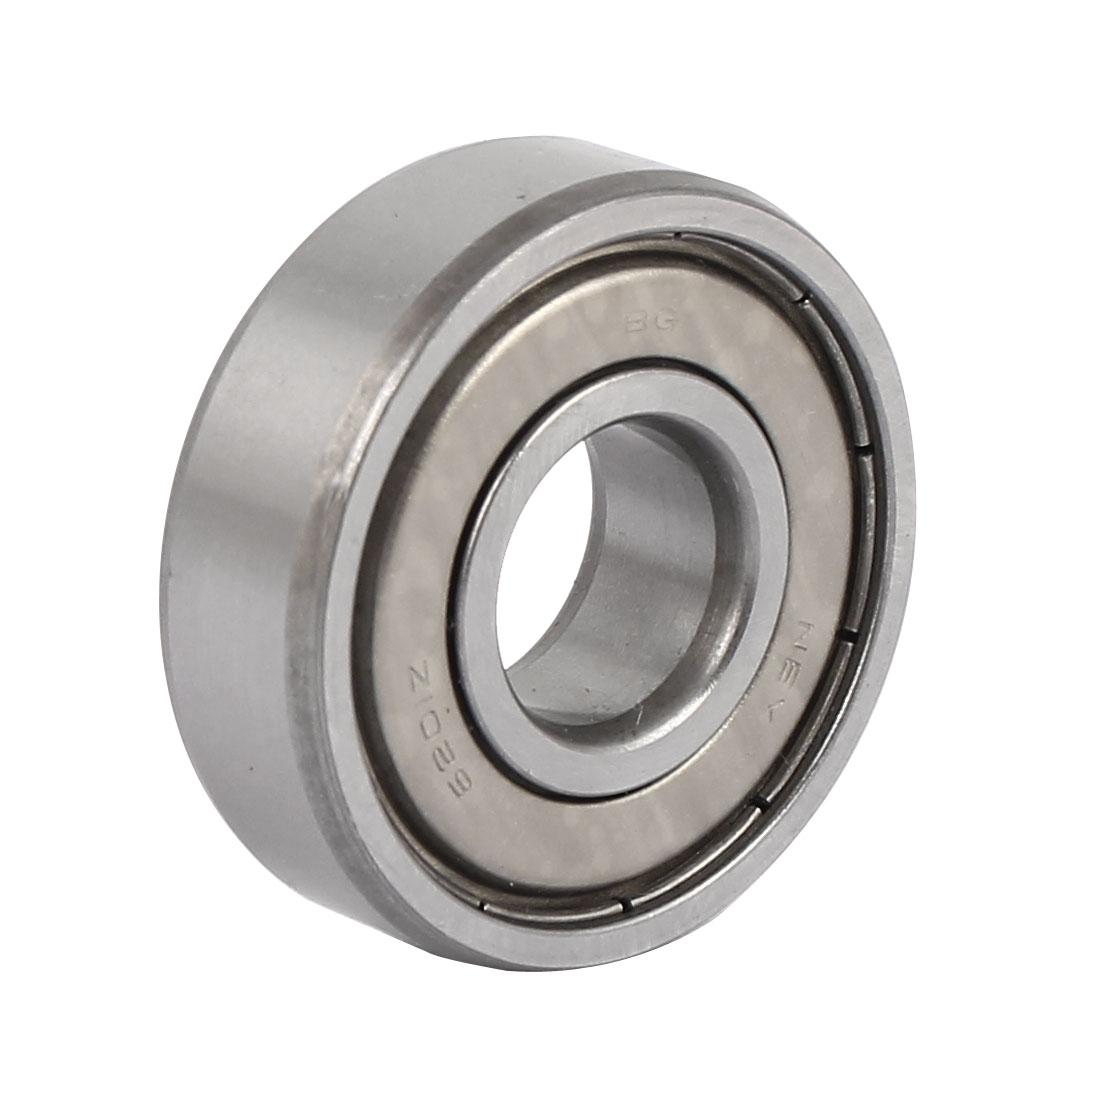 10mm x 32mm x 12mm Single Row Shielded Deep Groove Ball Bearing